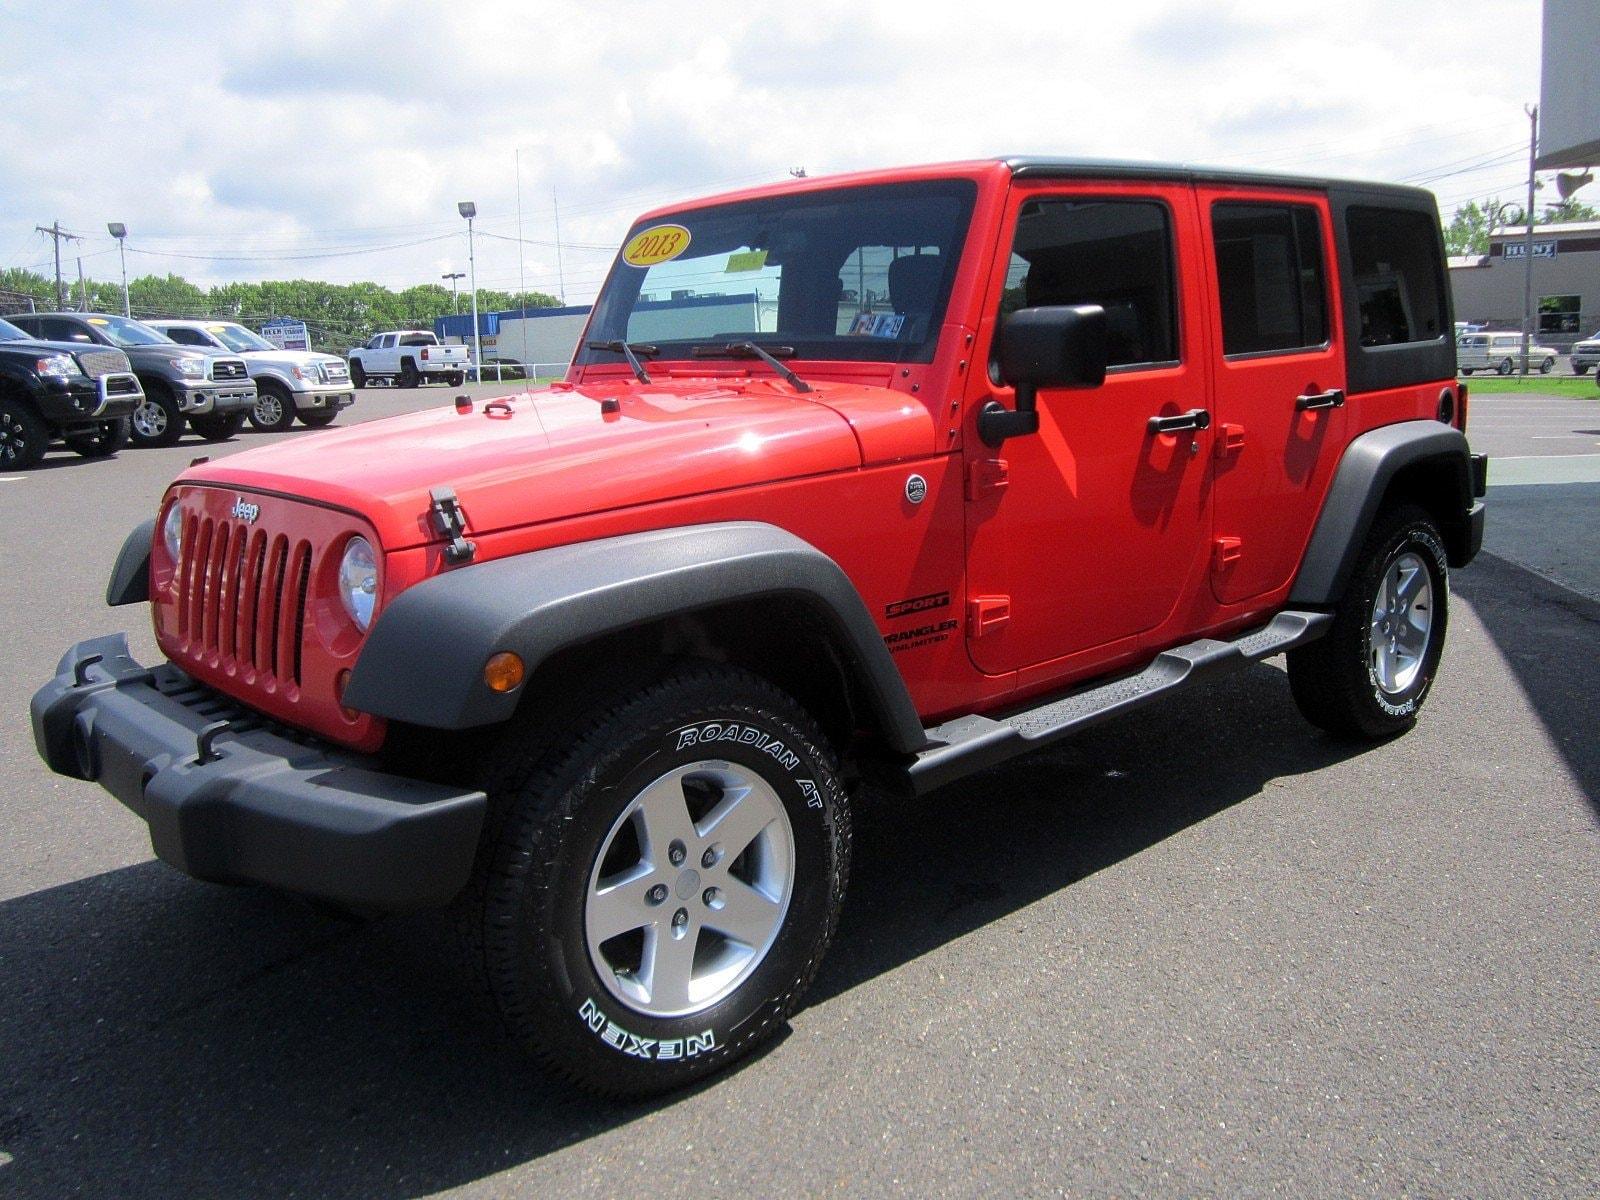 ... 2013 Jeep Wrangler Unlimited UNLIMITED SPORT 4WD HARD TOP 4 DOOR SUV ...